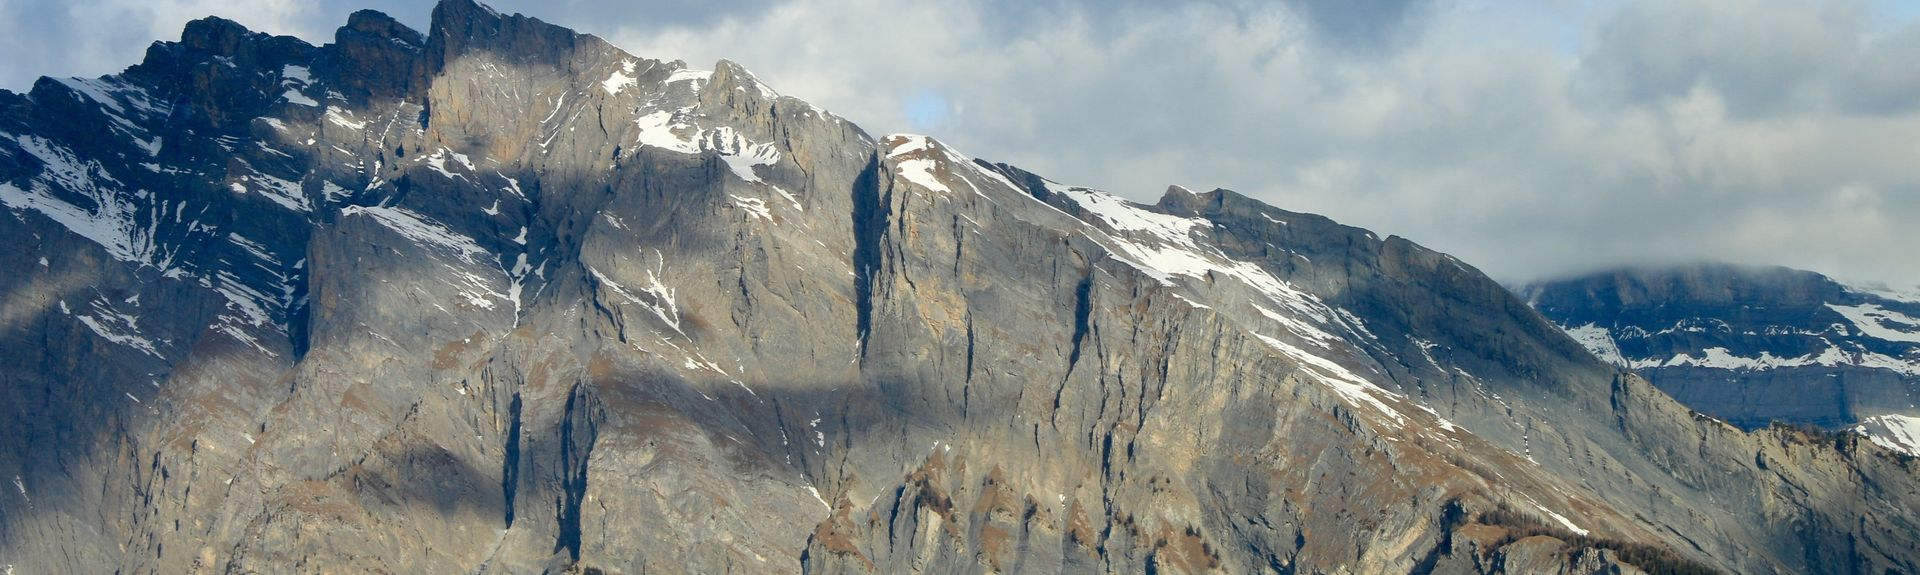 La Tzoumaz, Riddes, Valais, Suiza